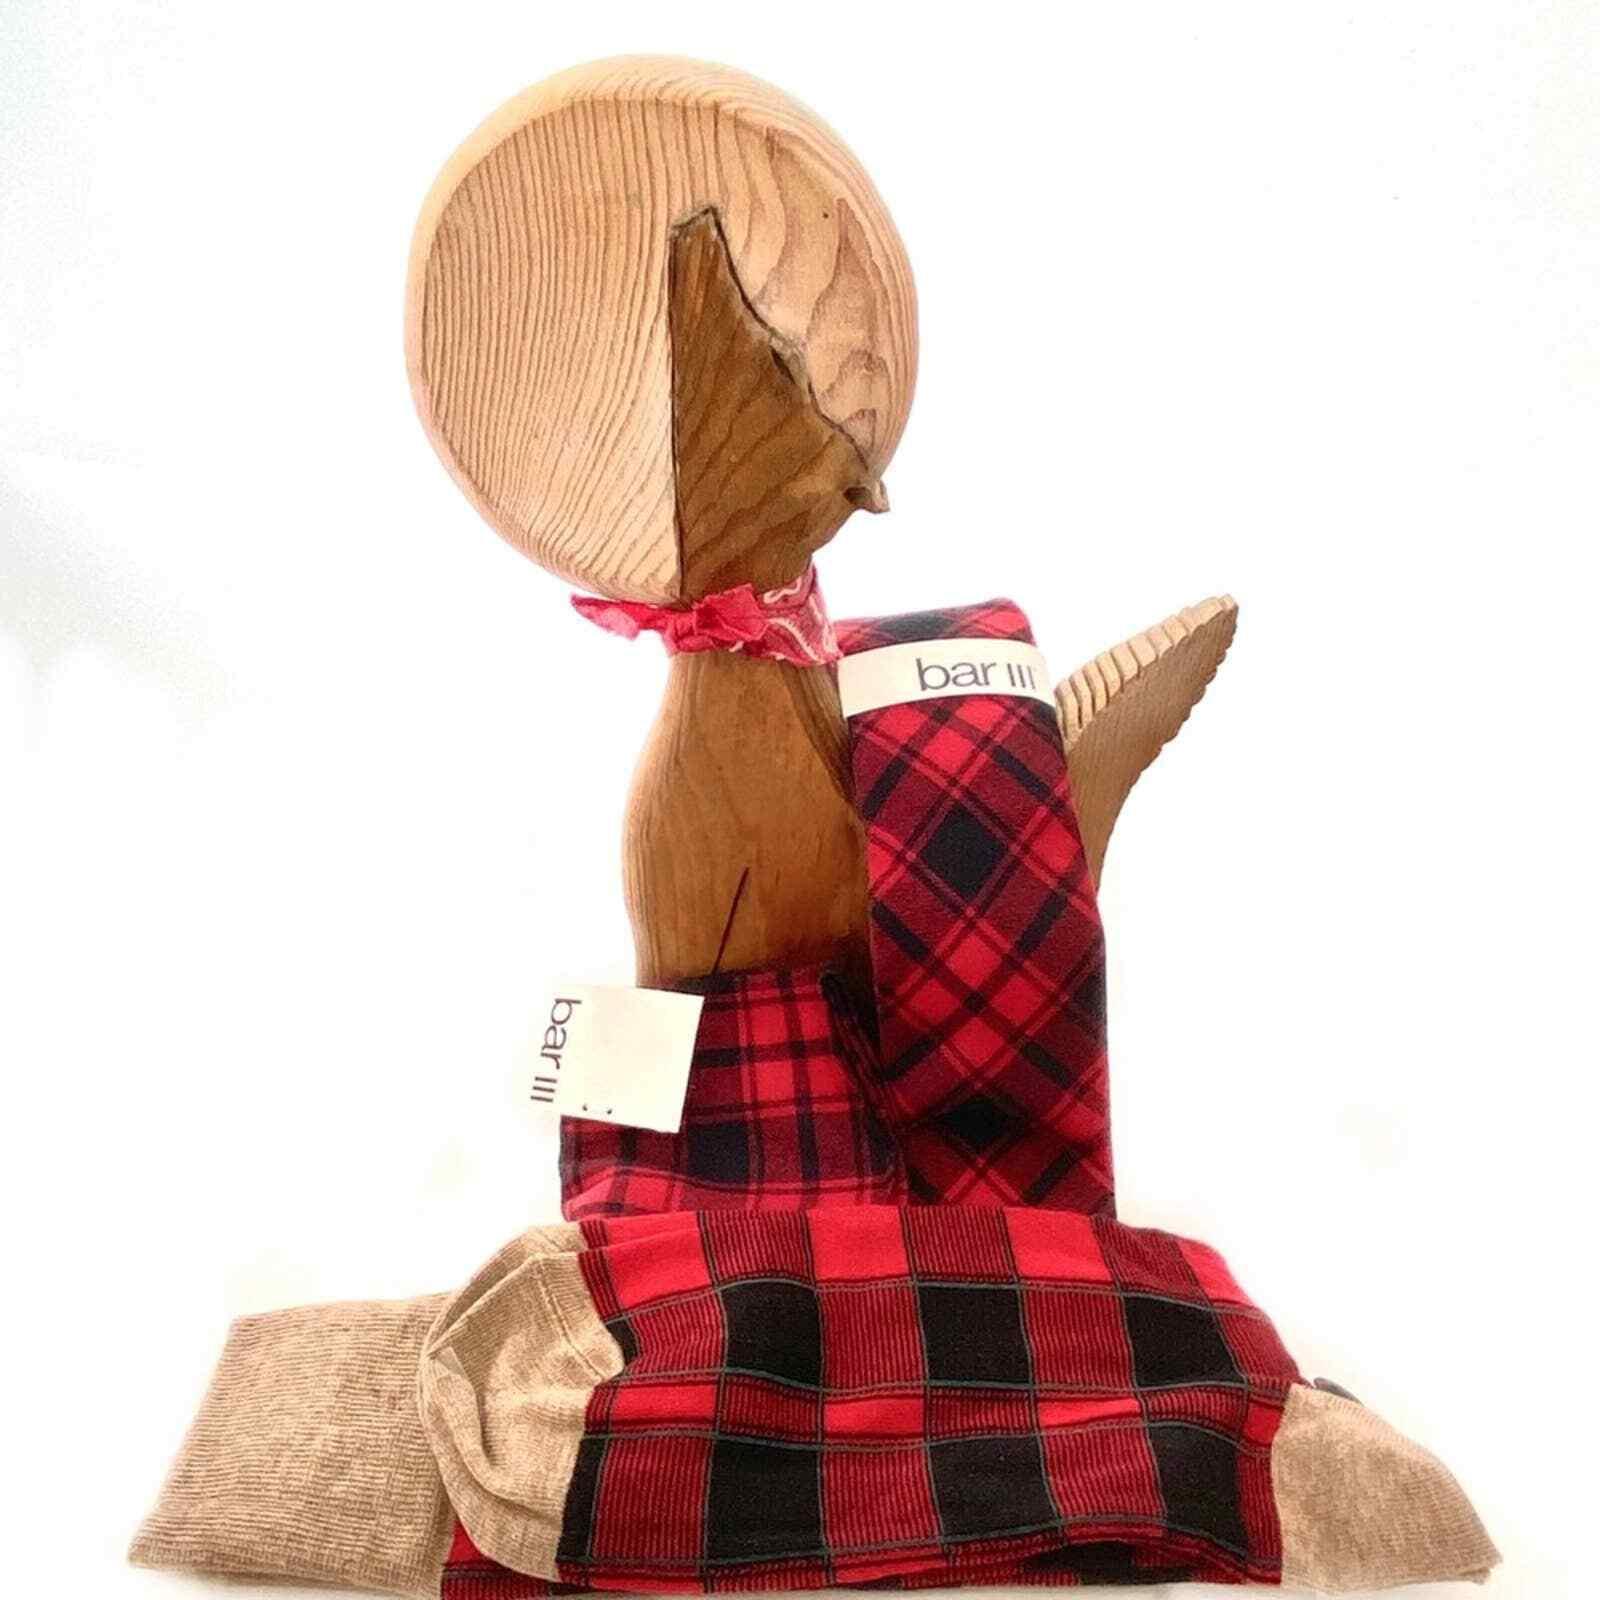 Macy's Men's Gift Bar III Buffalo Check Red Black Plaid Tie Pocket Square Socks